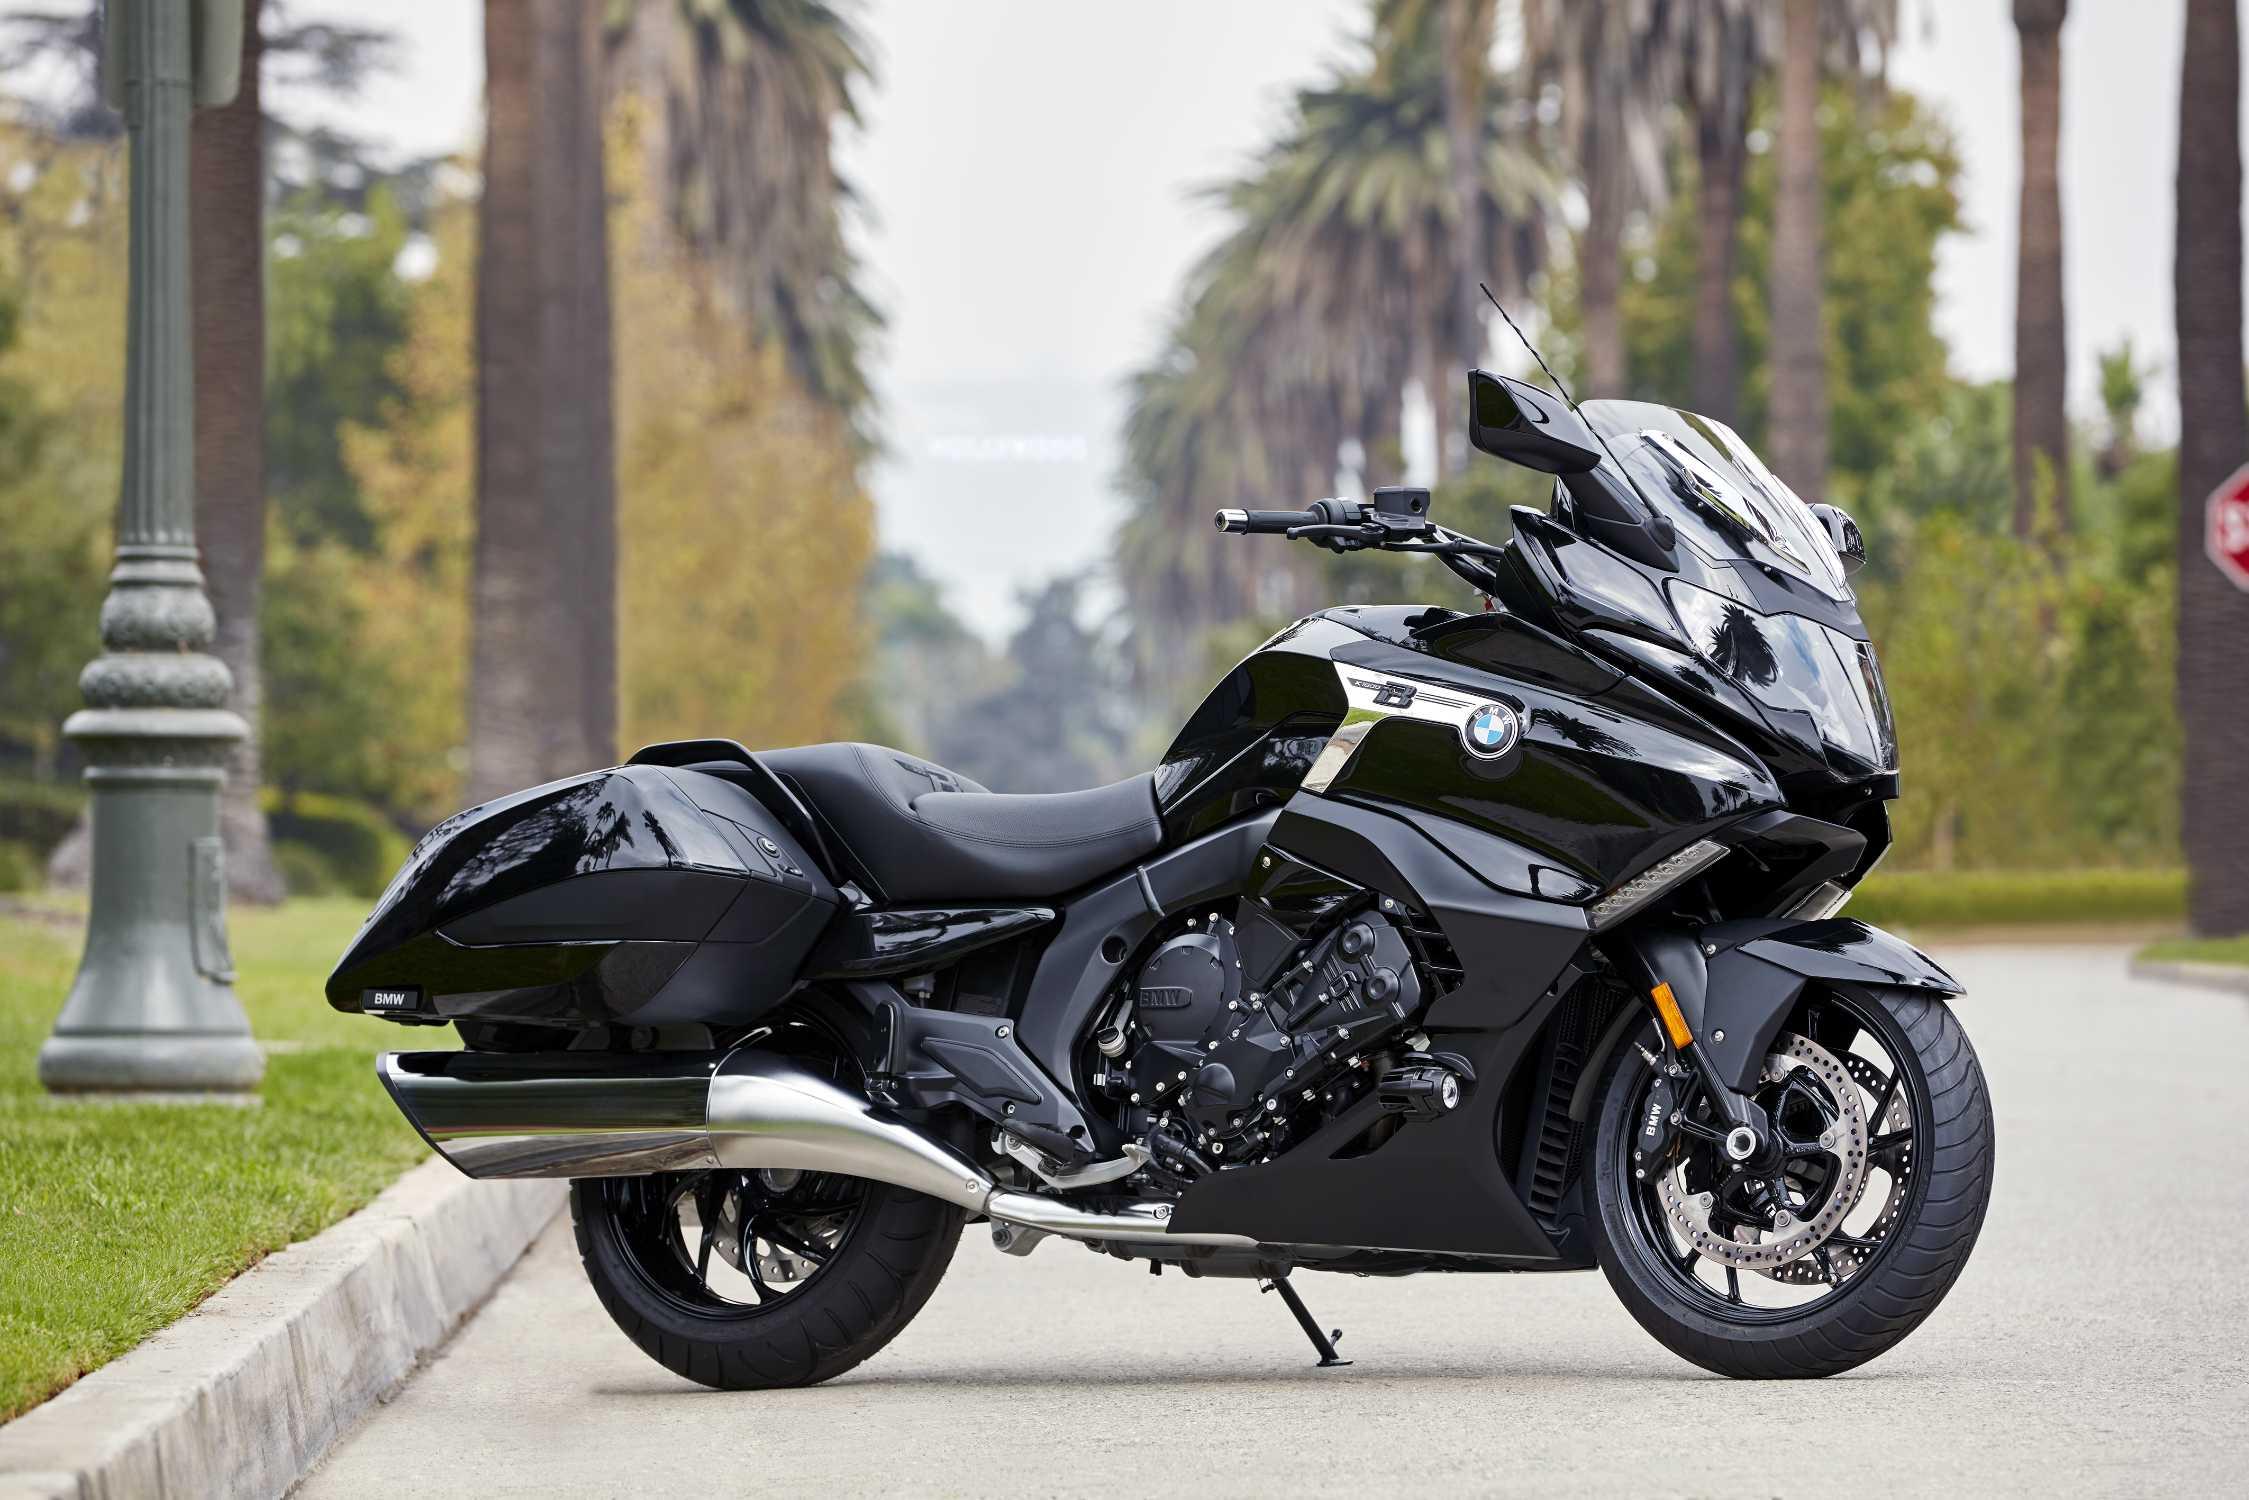 bmw k 1600 b unveiled to u.s. riders at progressive international